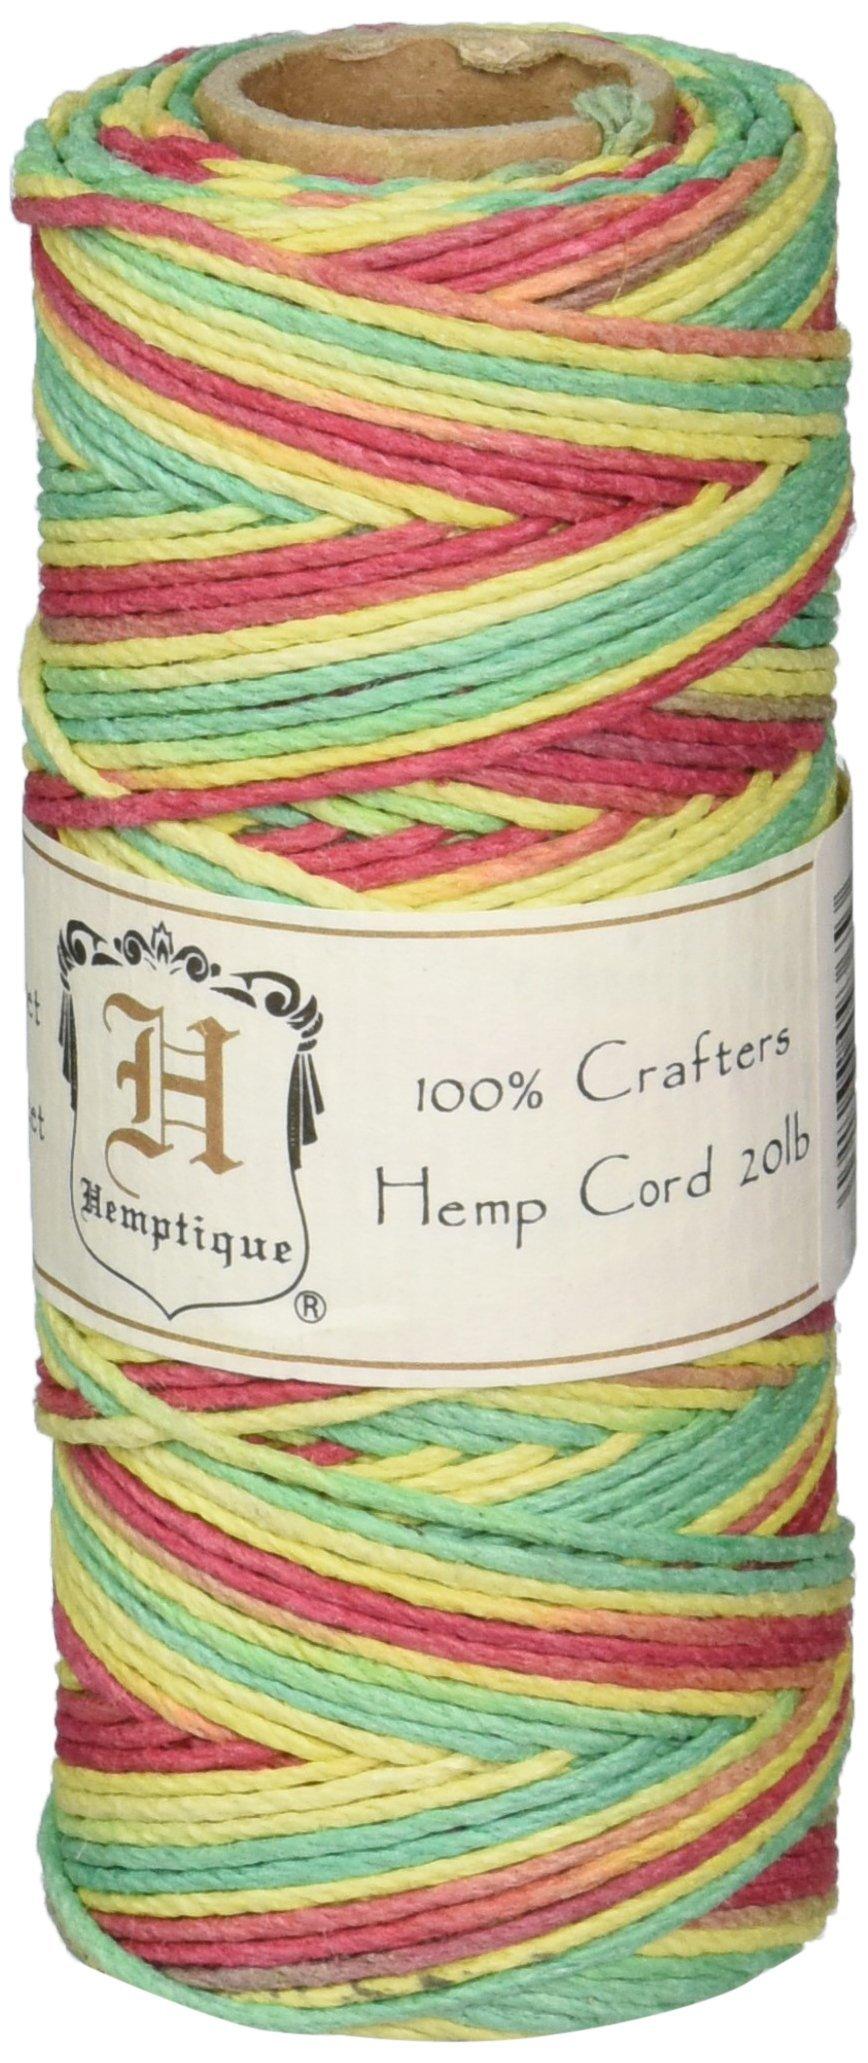 Hemptique 100% Hemp Cord Spool - 62.5 Meter Hemp String - Made with Love - No. 20 ~ 1mm Cord Thread for Jewelry Making, Macrame, Scrapbooking, DIY, & More - Variegated Rasta